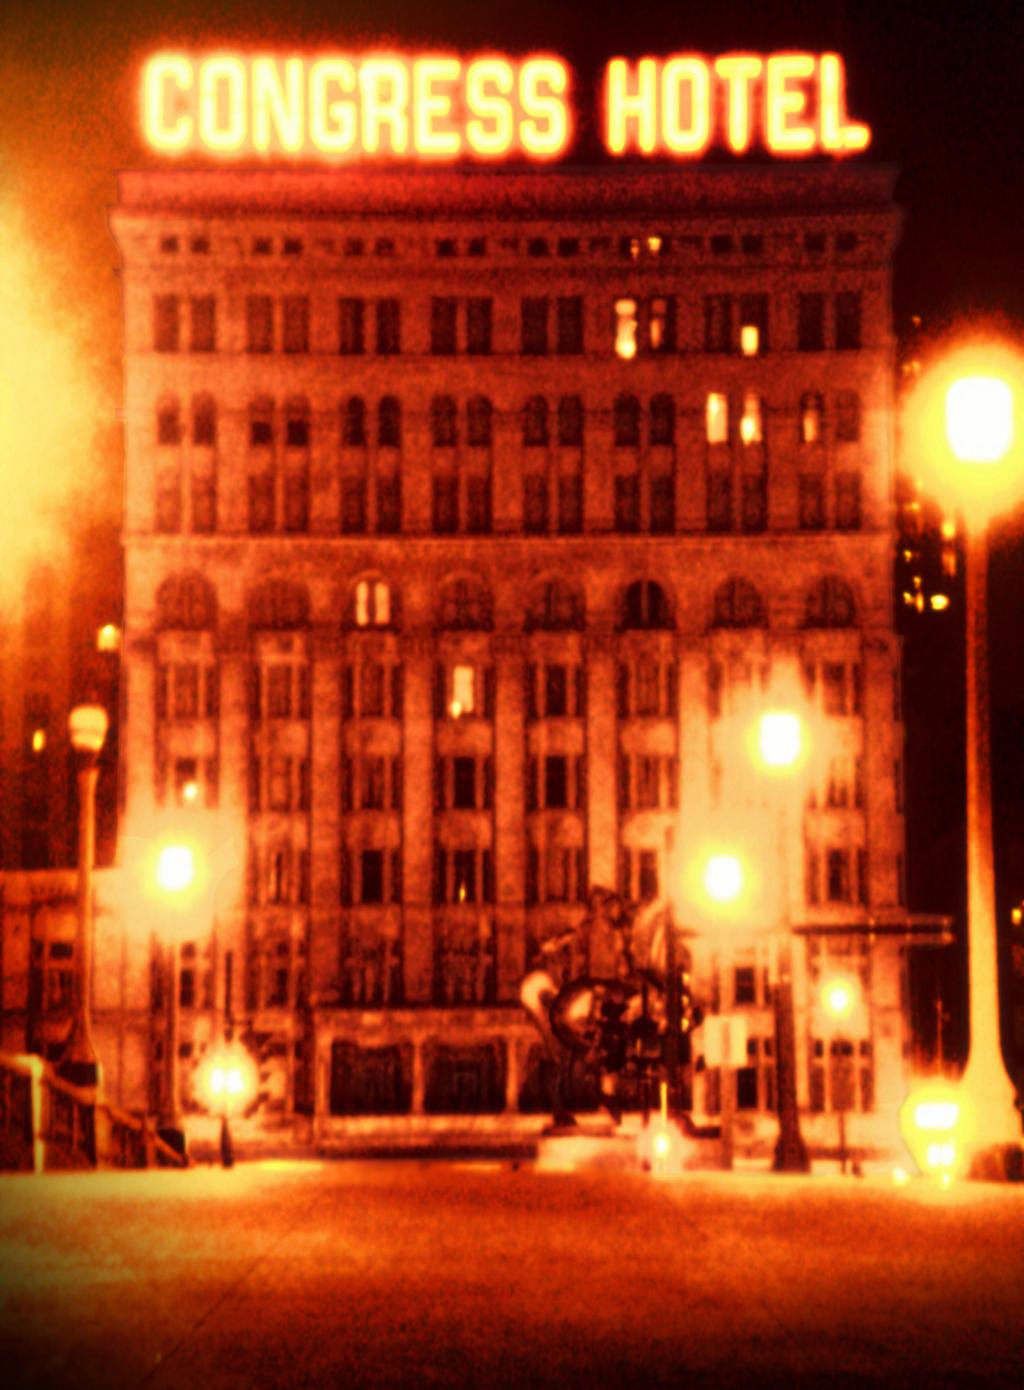 Congress Hotel- Chicago (ReTouch) by Kadarr